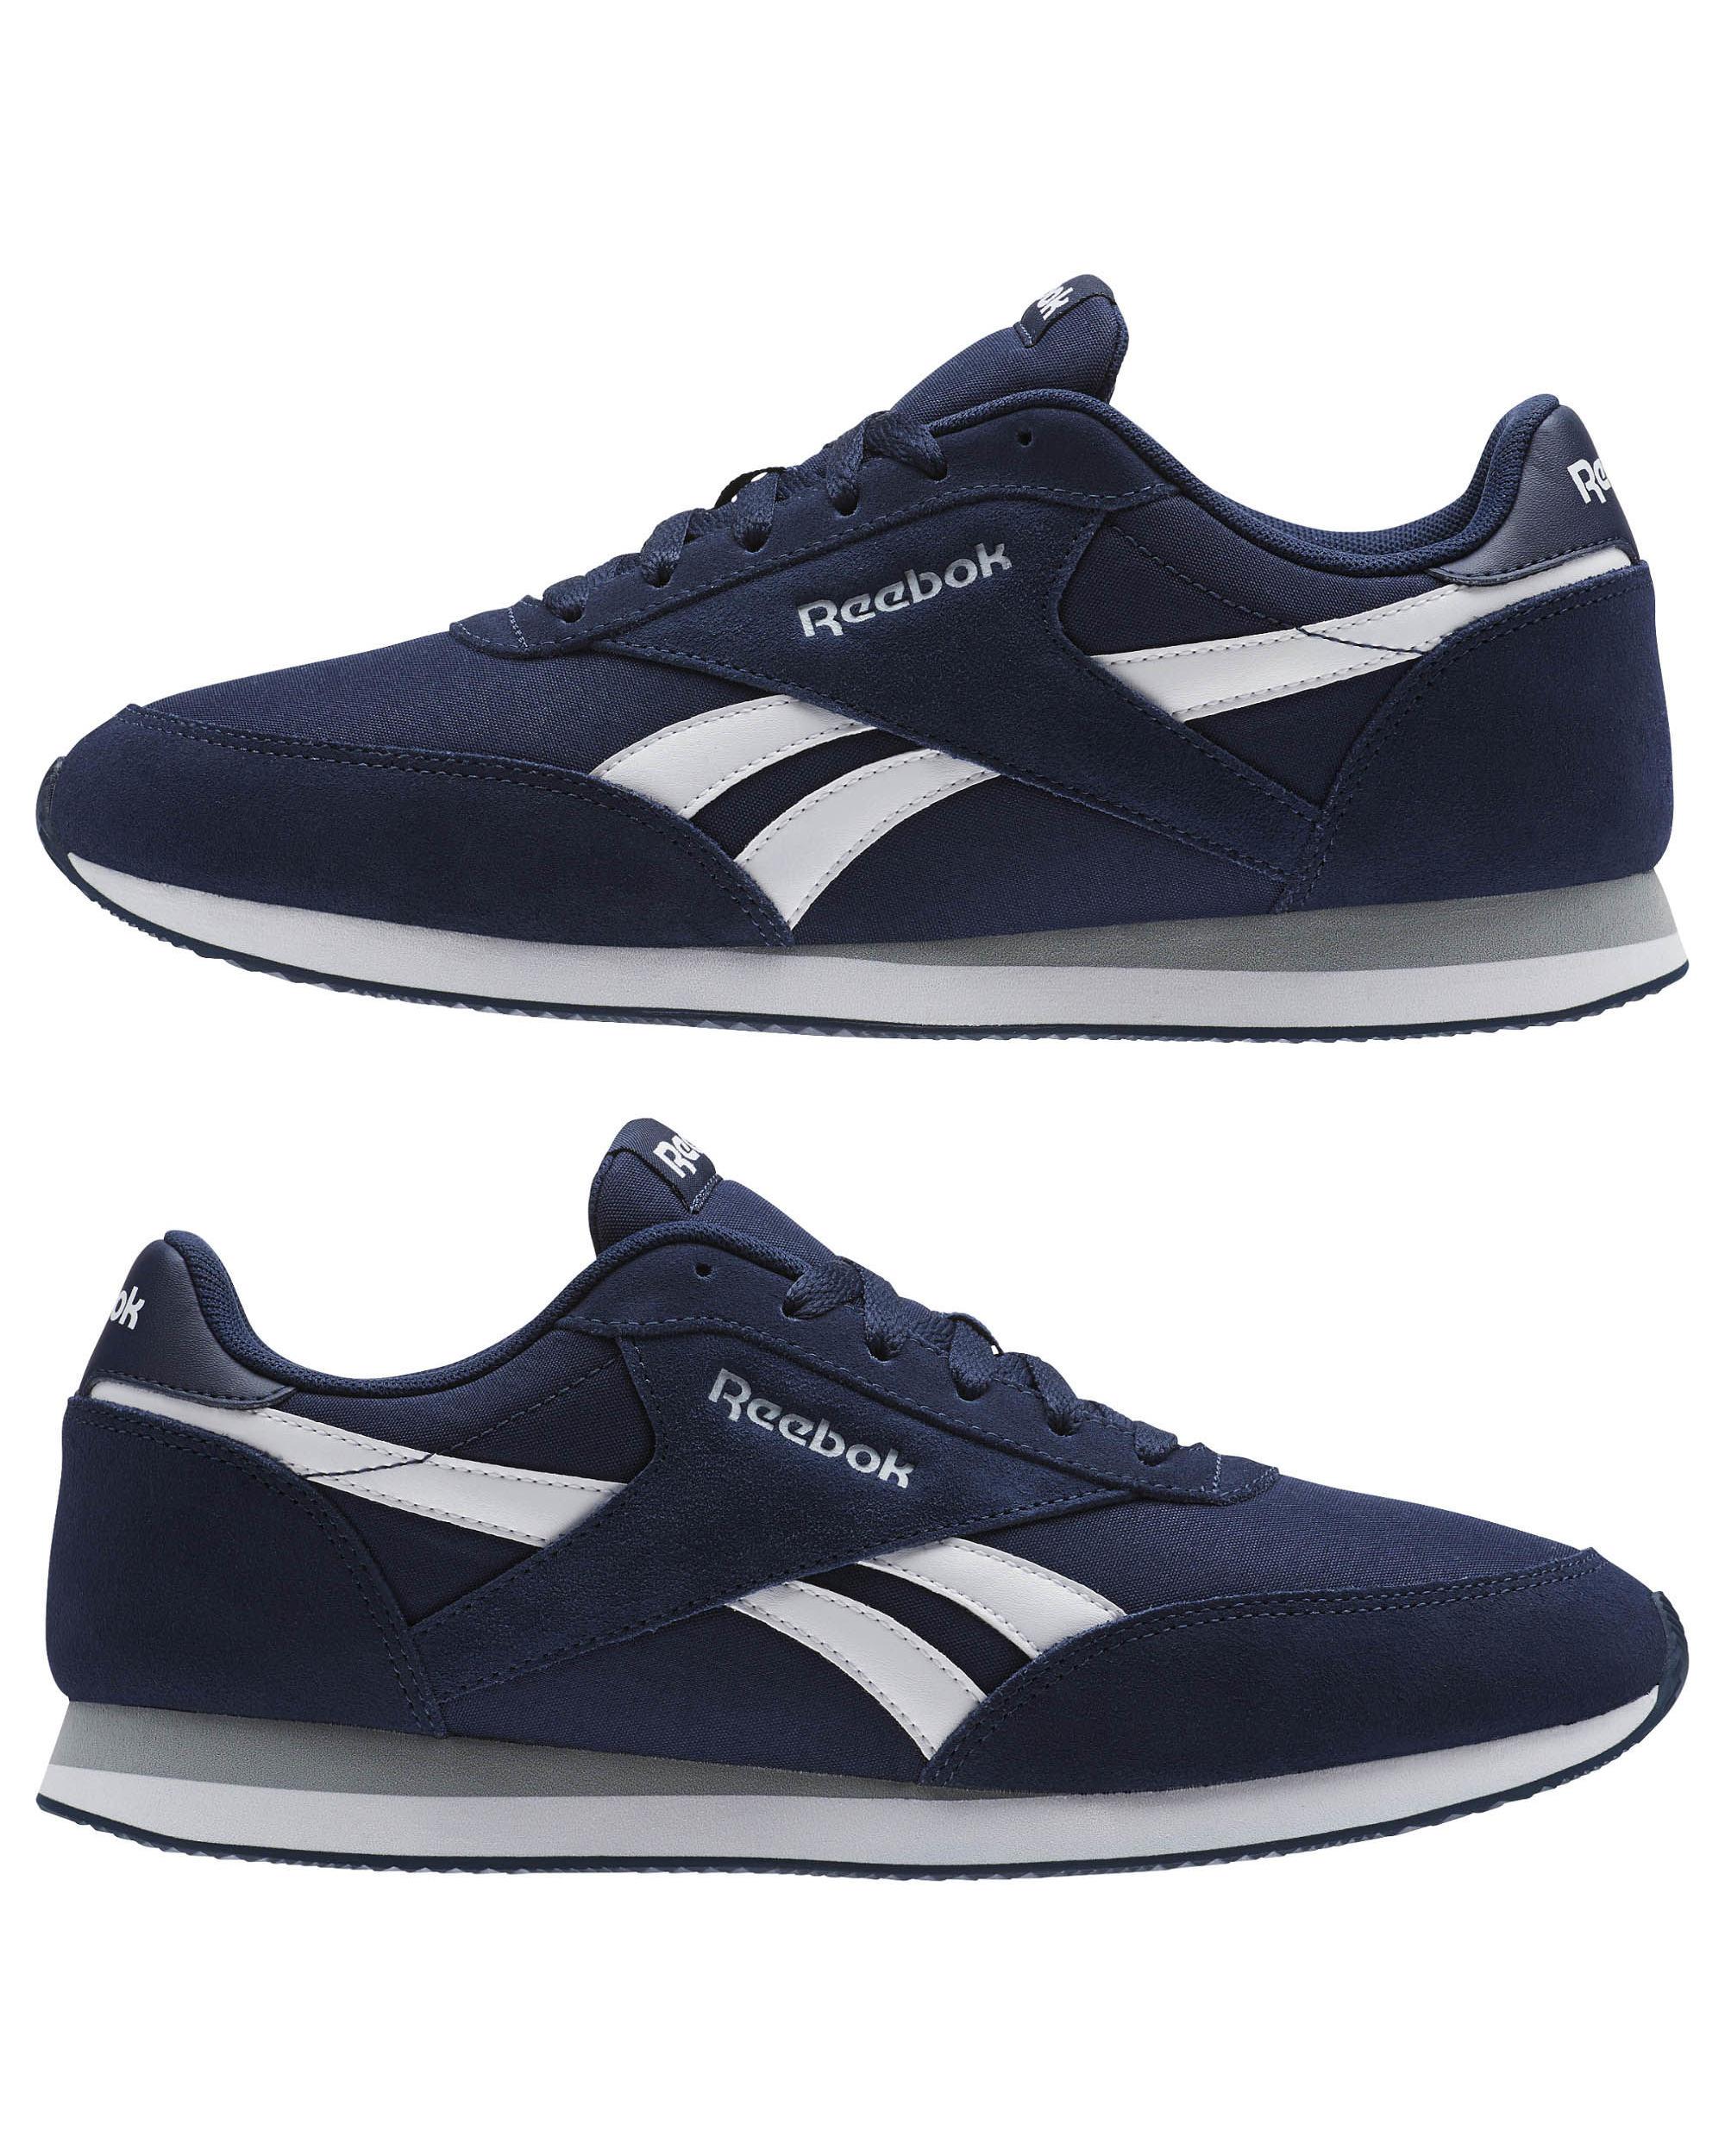 d190a3a437ac5 Reebok Sneakers Shoes Schuhe Sport Royal classic jogger Navy Men